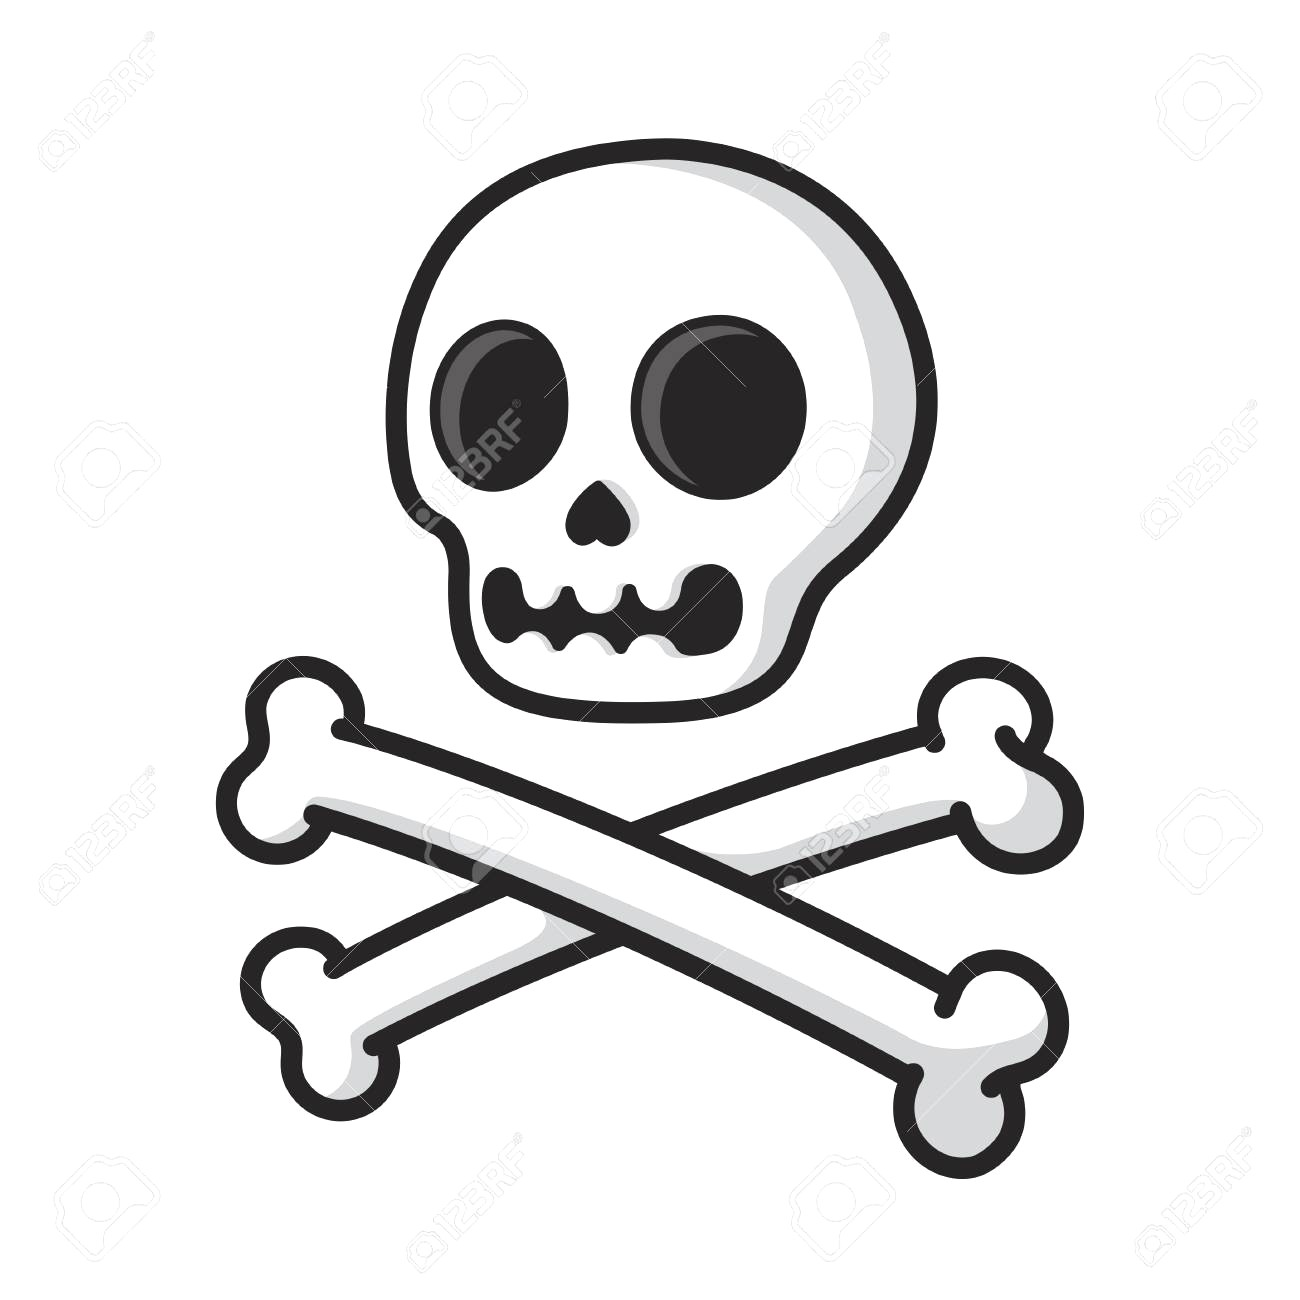 1300x1300 Simple Cartoon Skull And Crossbones Isolated On White